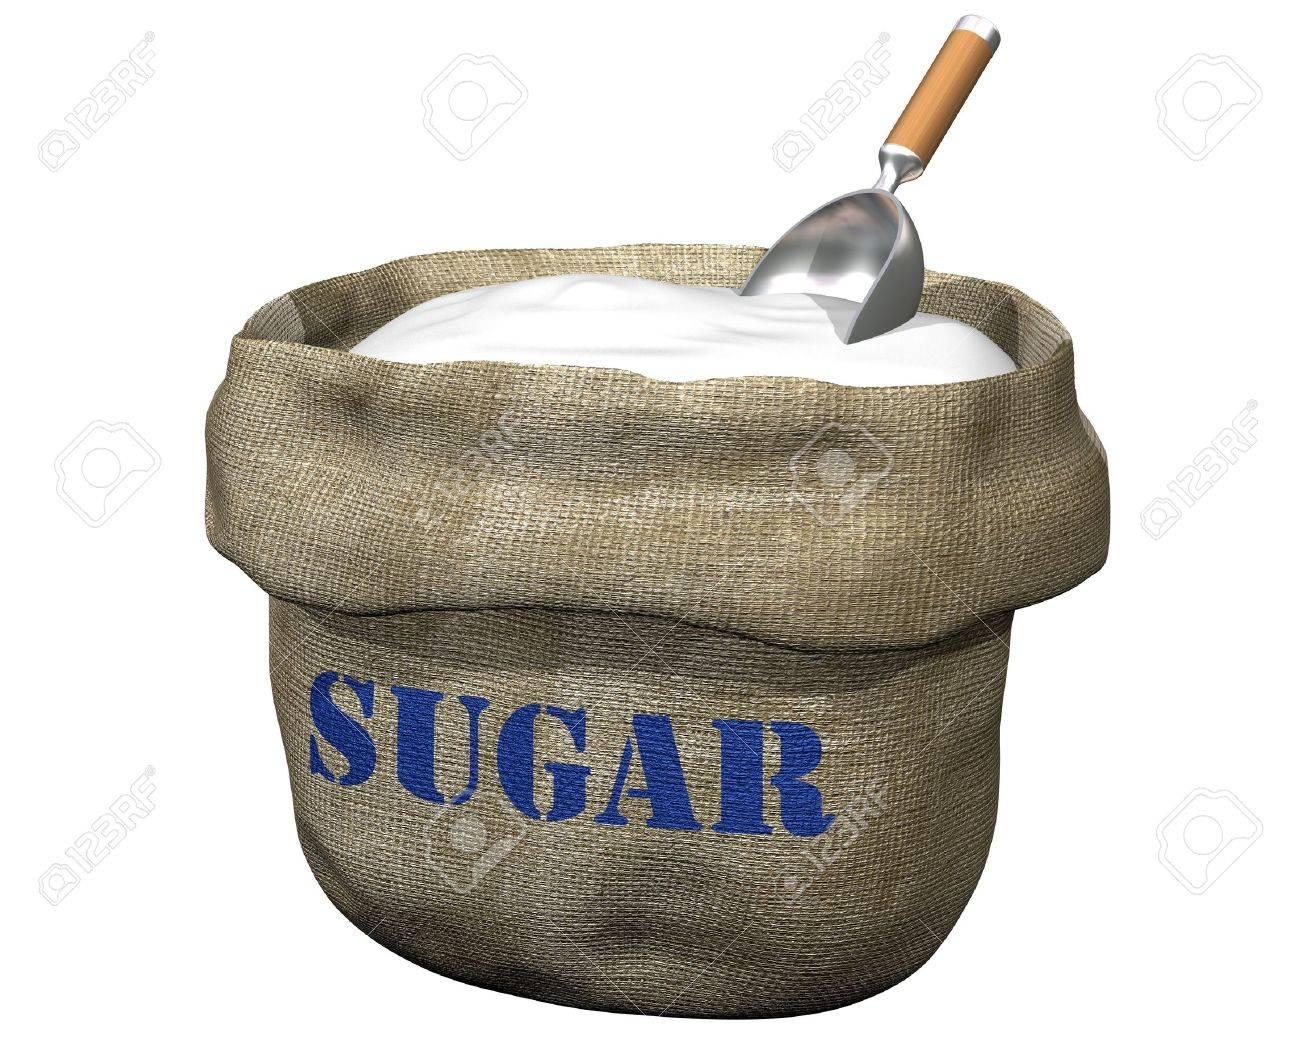 sugar  Isolated illustration  Sugar